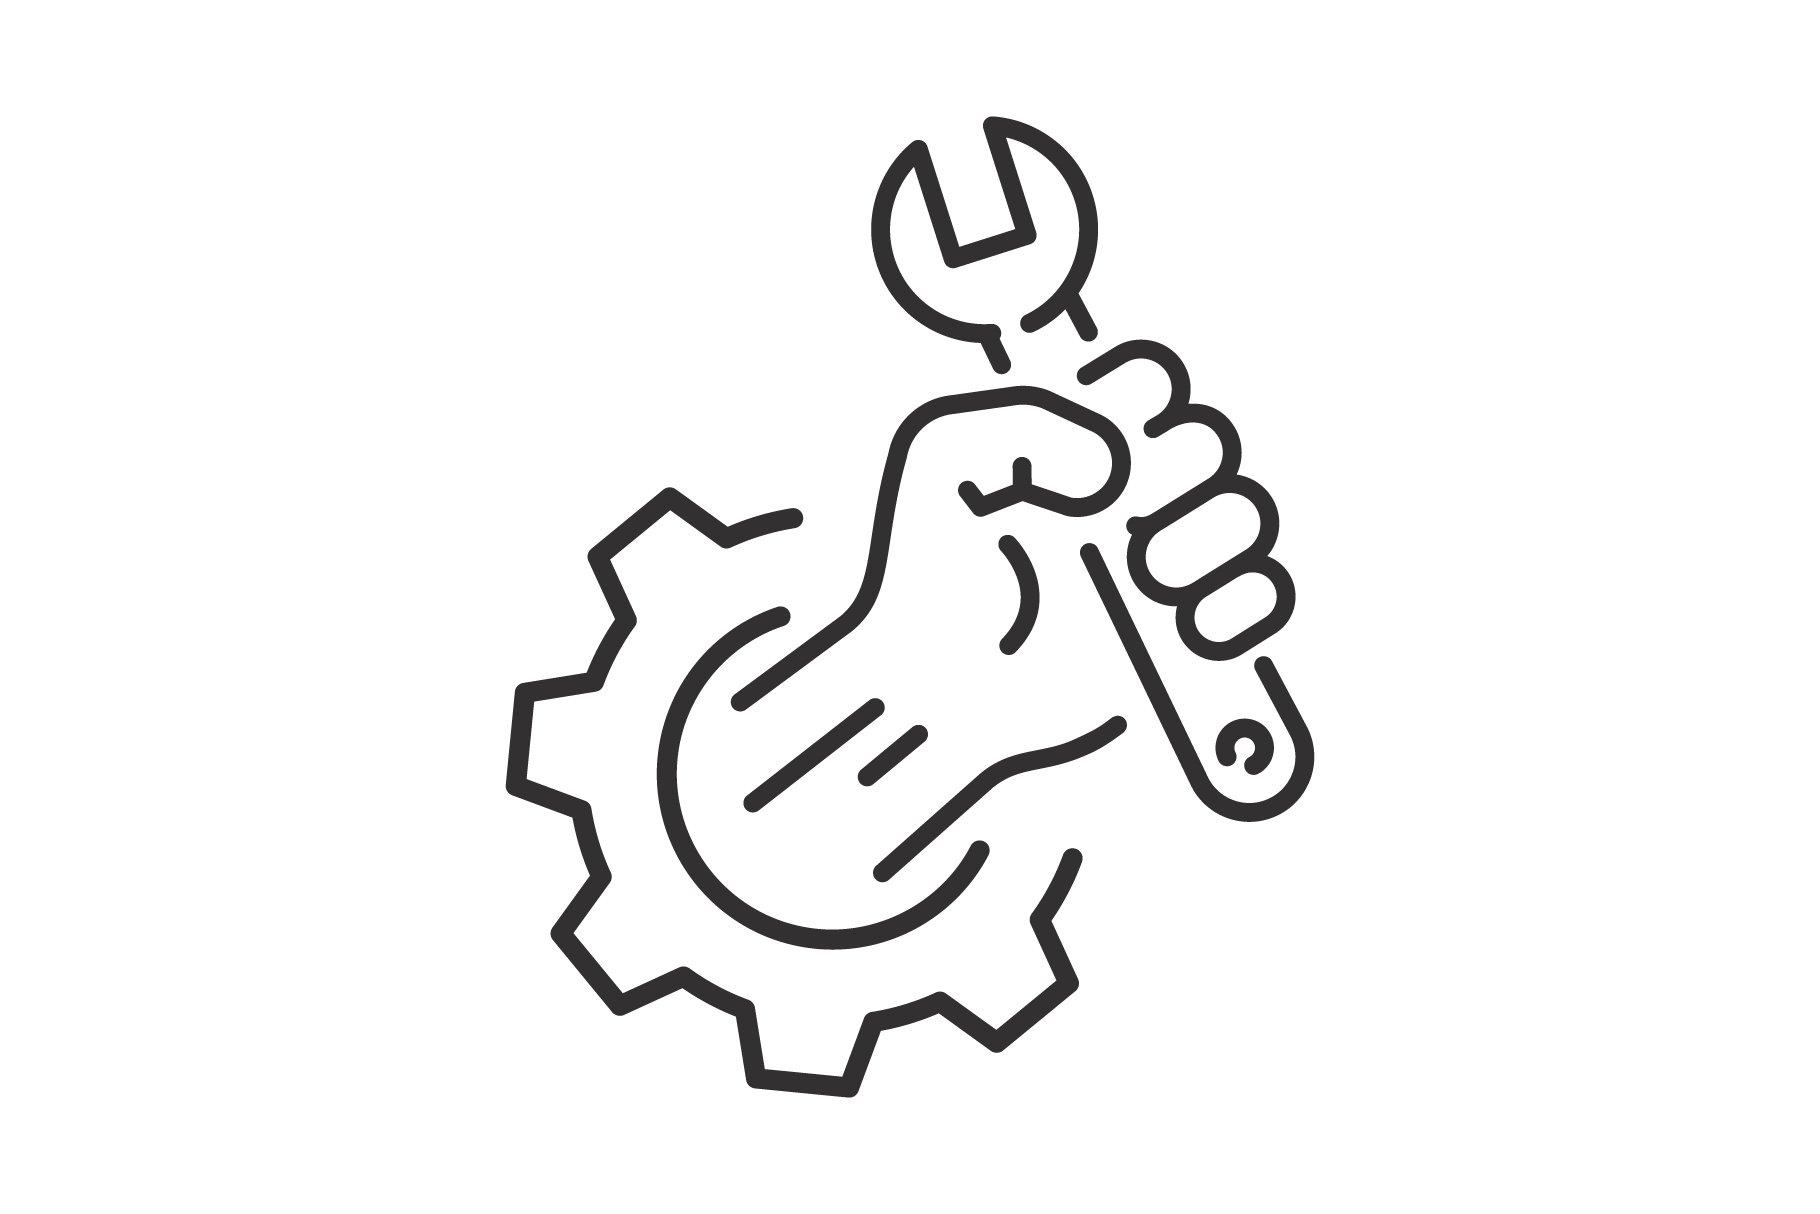 maintenance icon, repair service | Pre-Designed Illustrator Graphics ~  Creative Market